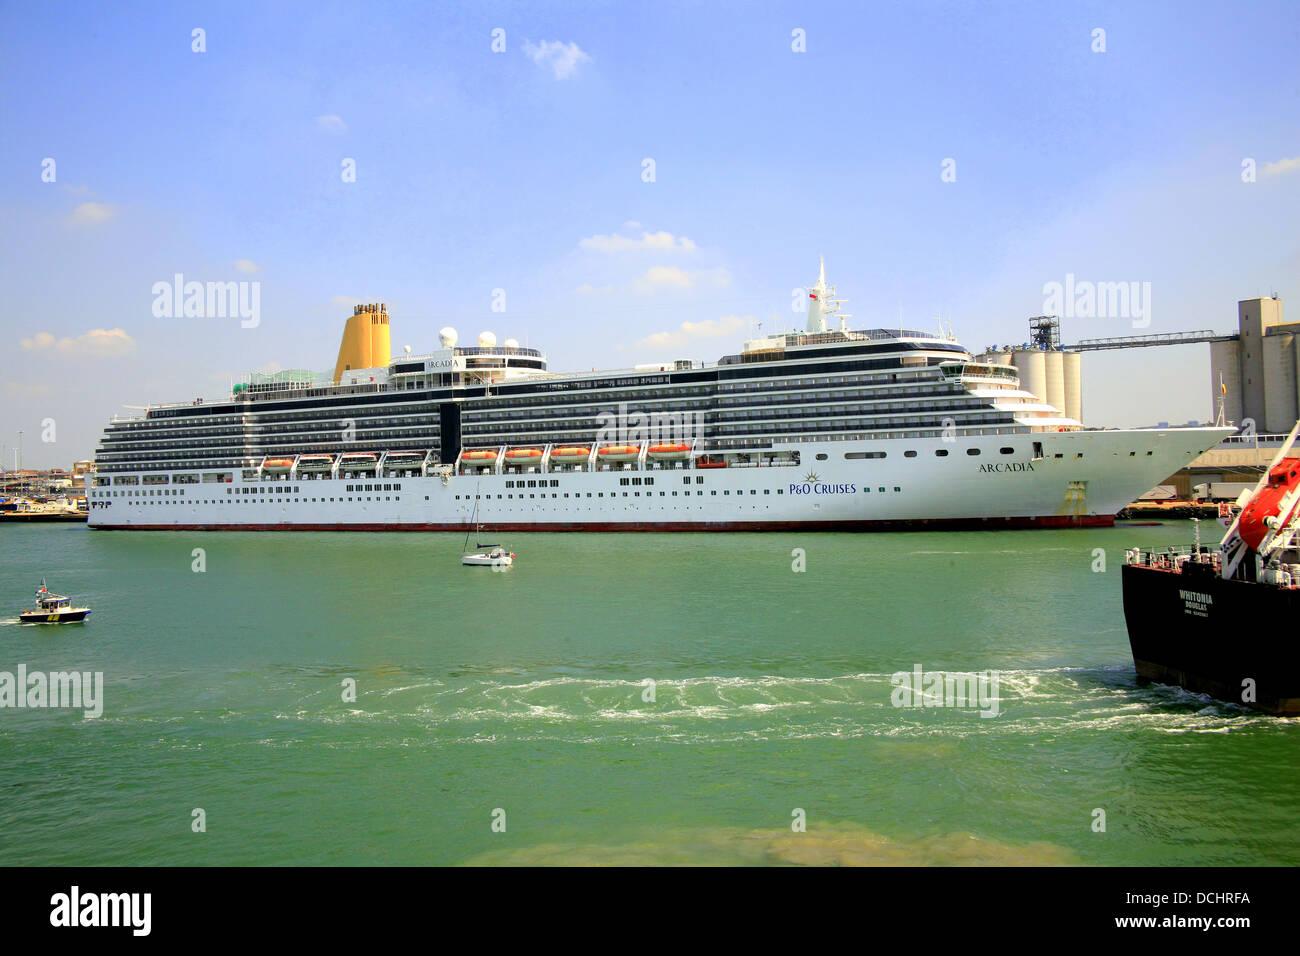 The 'Arcadia' cruise liner preparing to sail at Southampton docks. - Stock Image